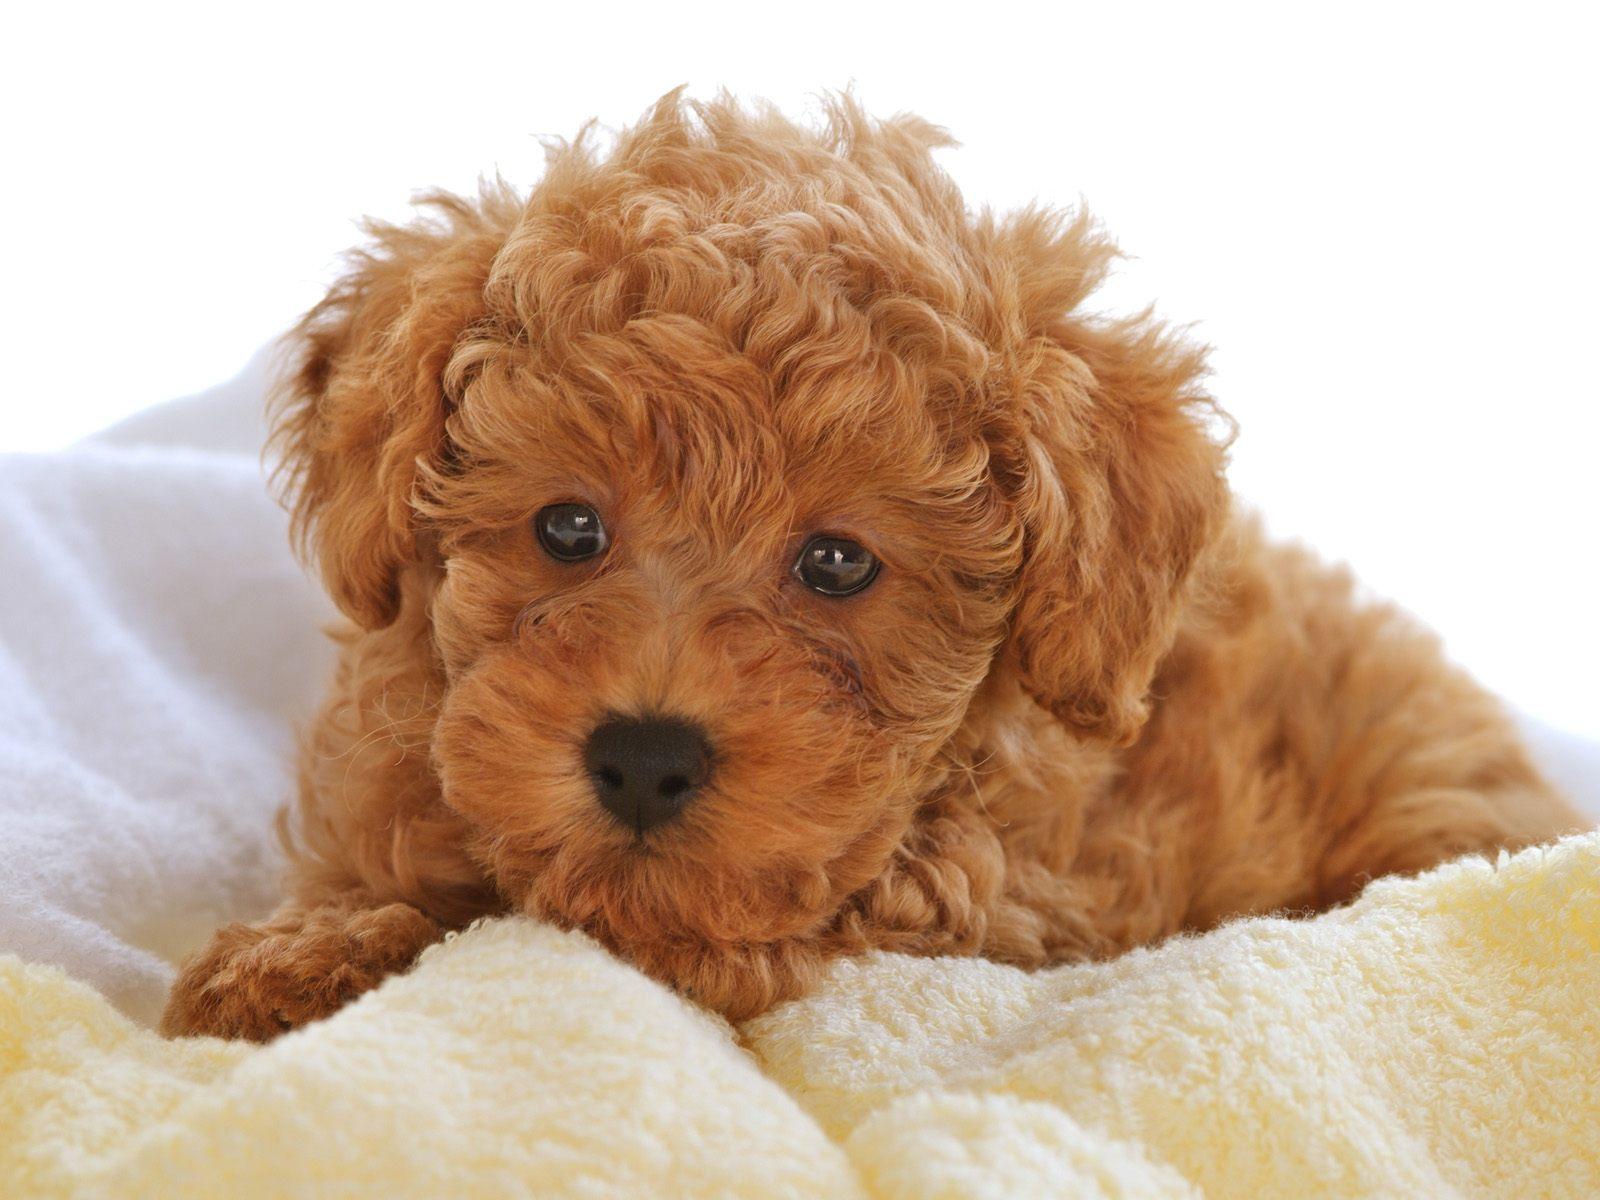 Le caniche ou caniche races de chiens animaux - Dessin caniche ...